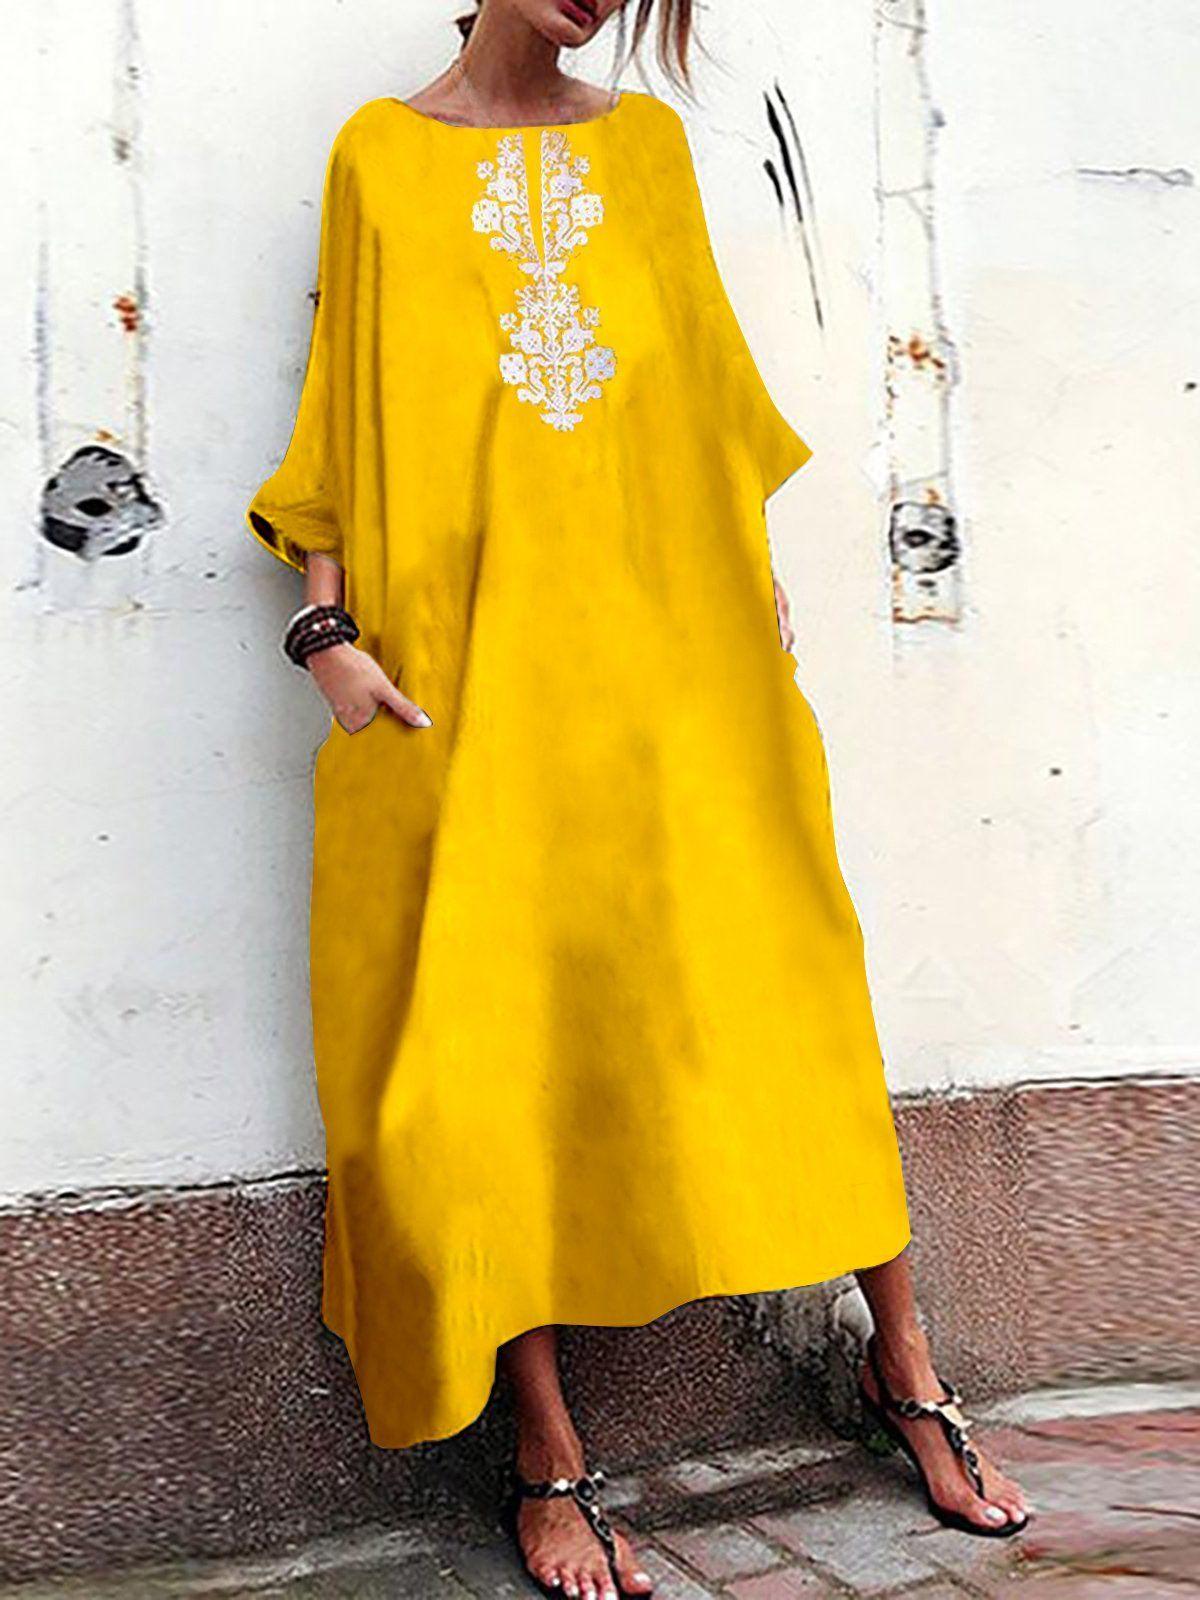 ee2361da6ca Yellow Polyester Stripe Floral Summer Dress